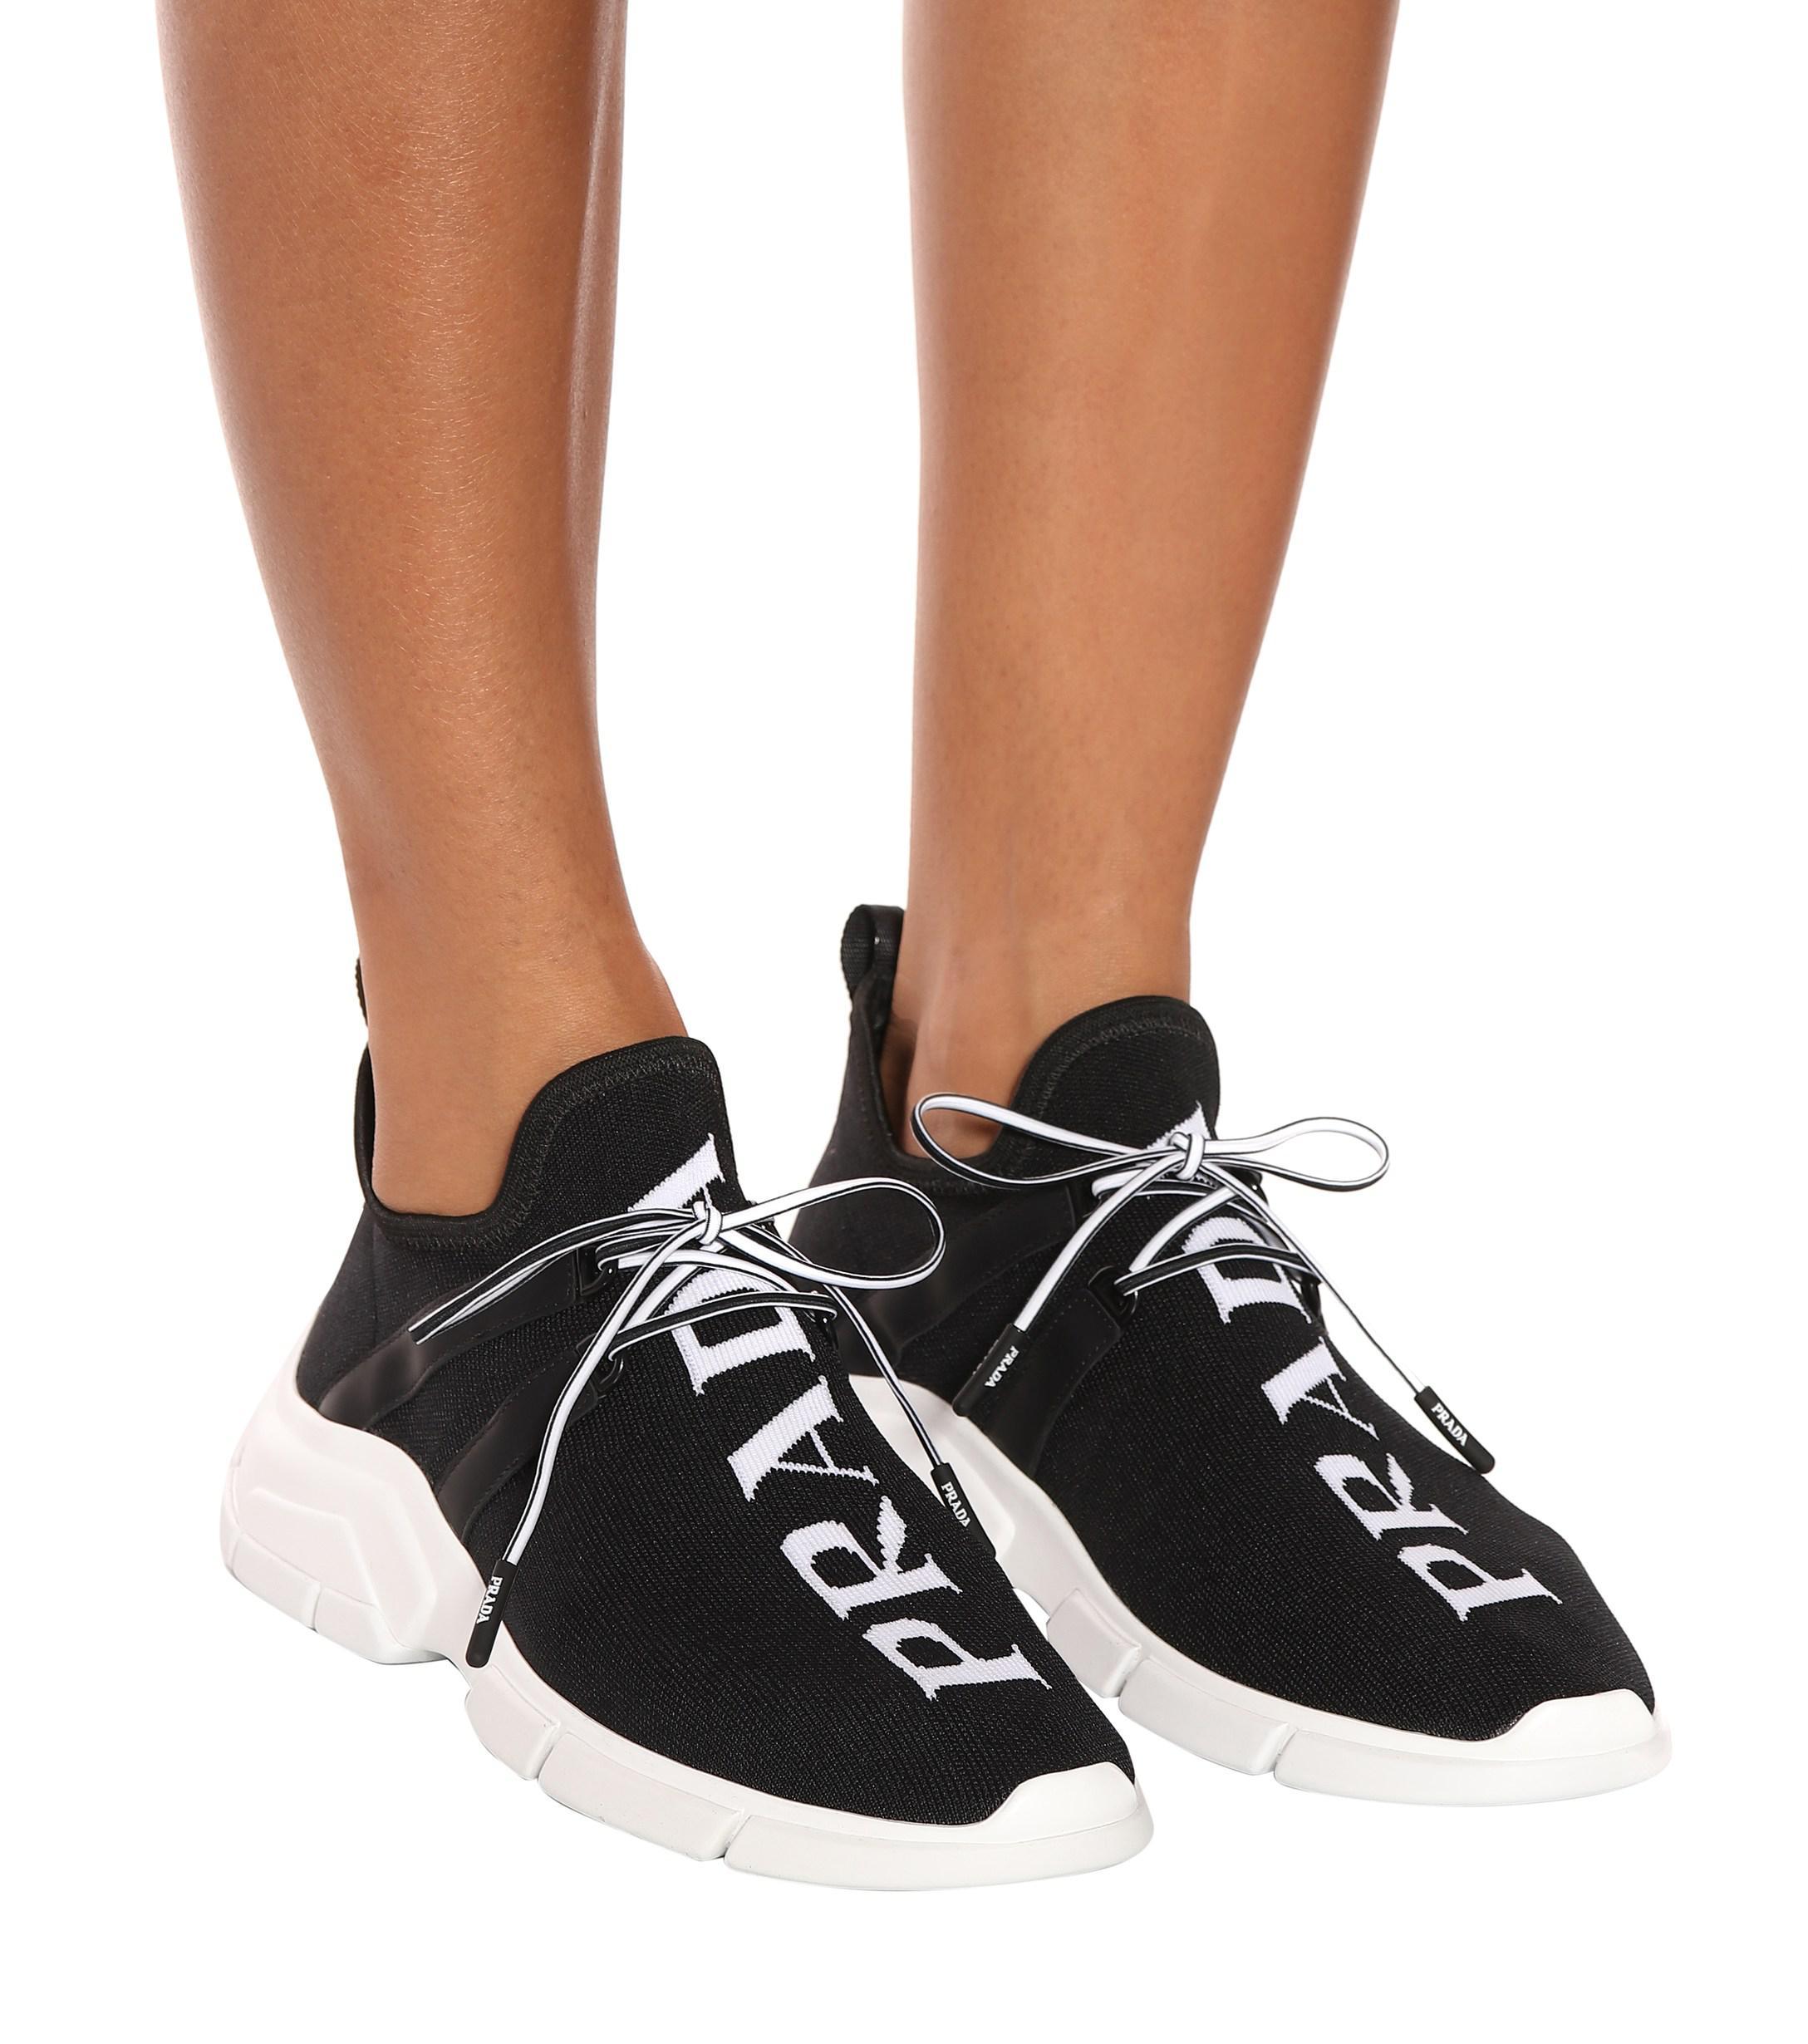 7e2af43620 Women's Black Stretch-knit Sneakers